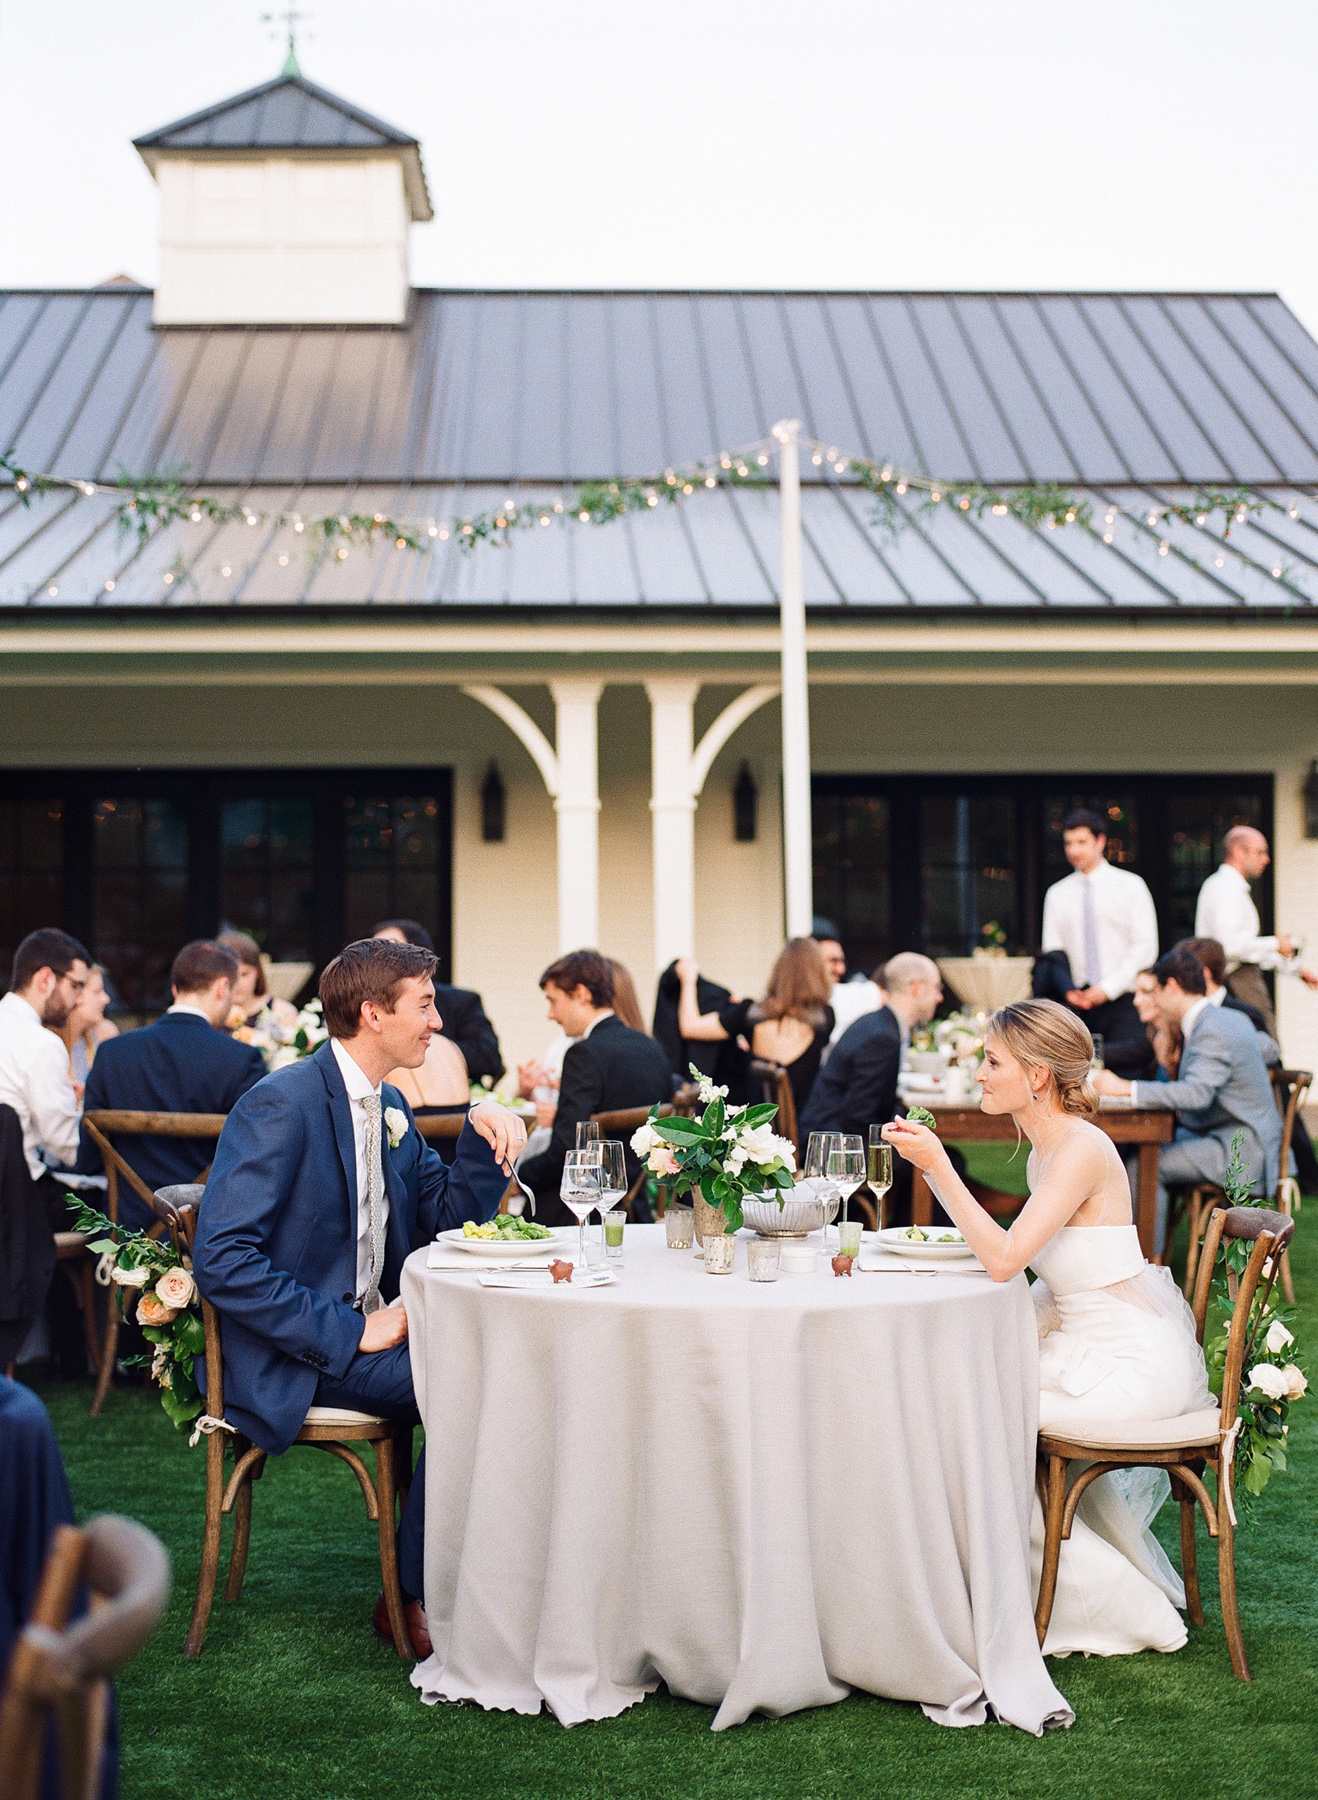 Raleigh Wedding Film Photographer 28.jpg